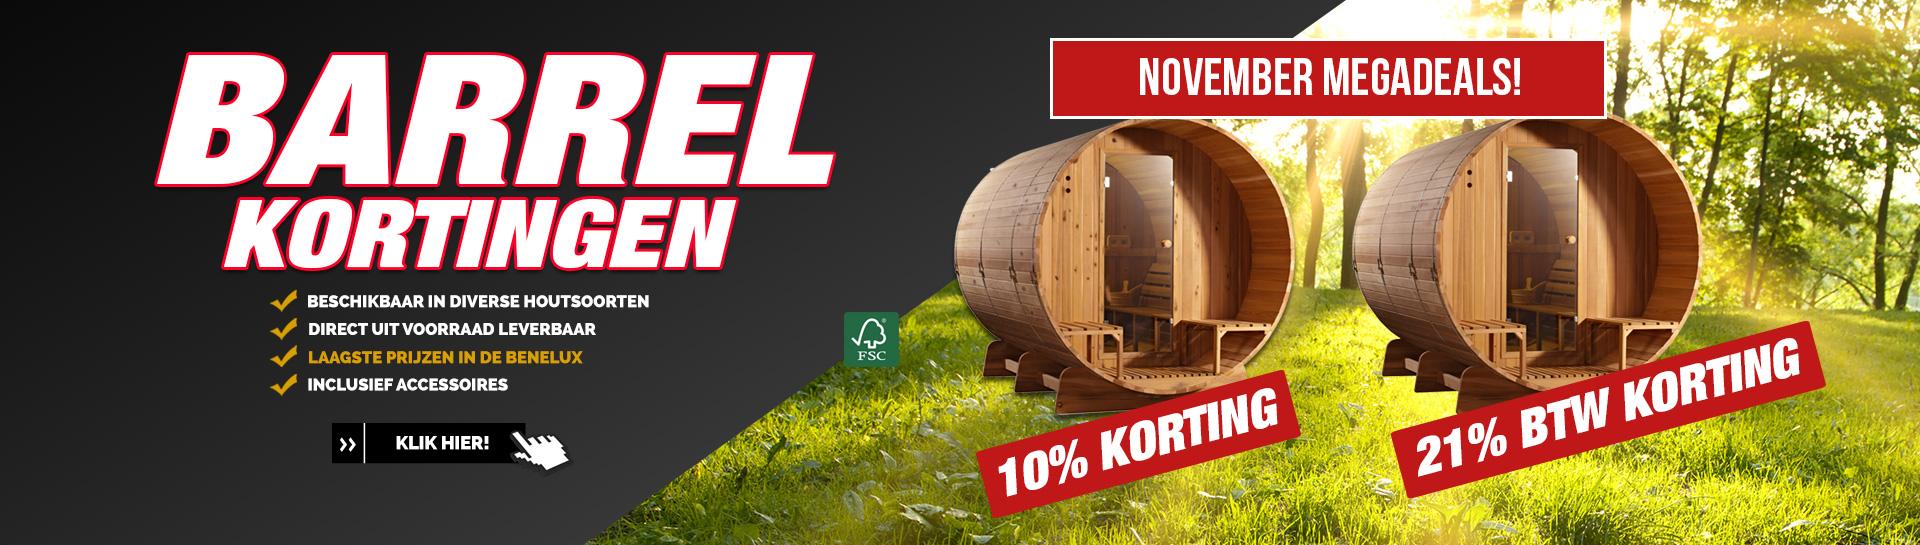 Barrel sauna november actie